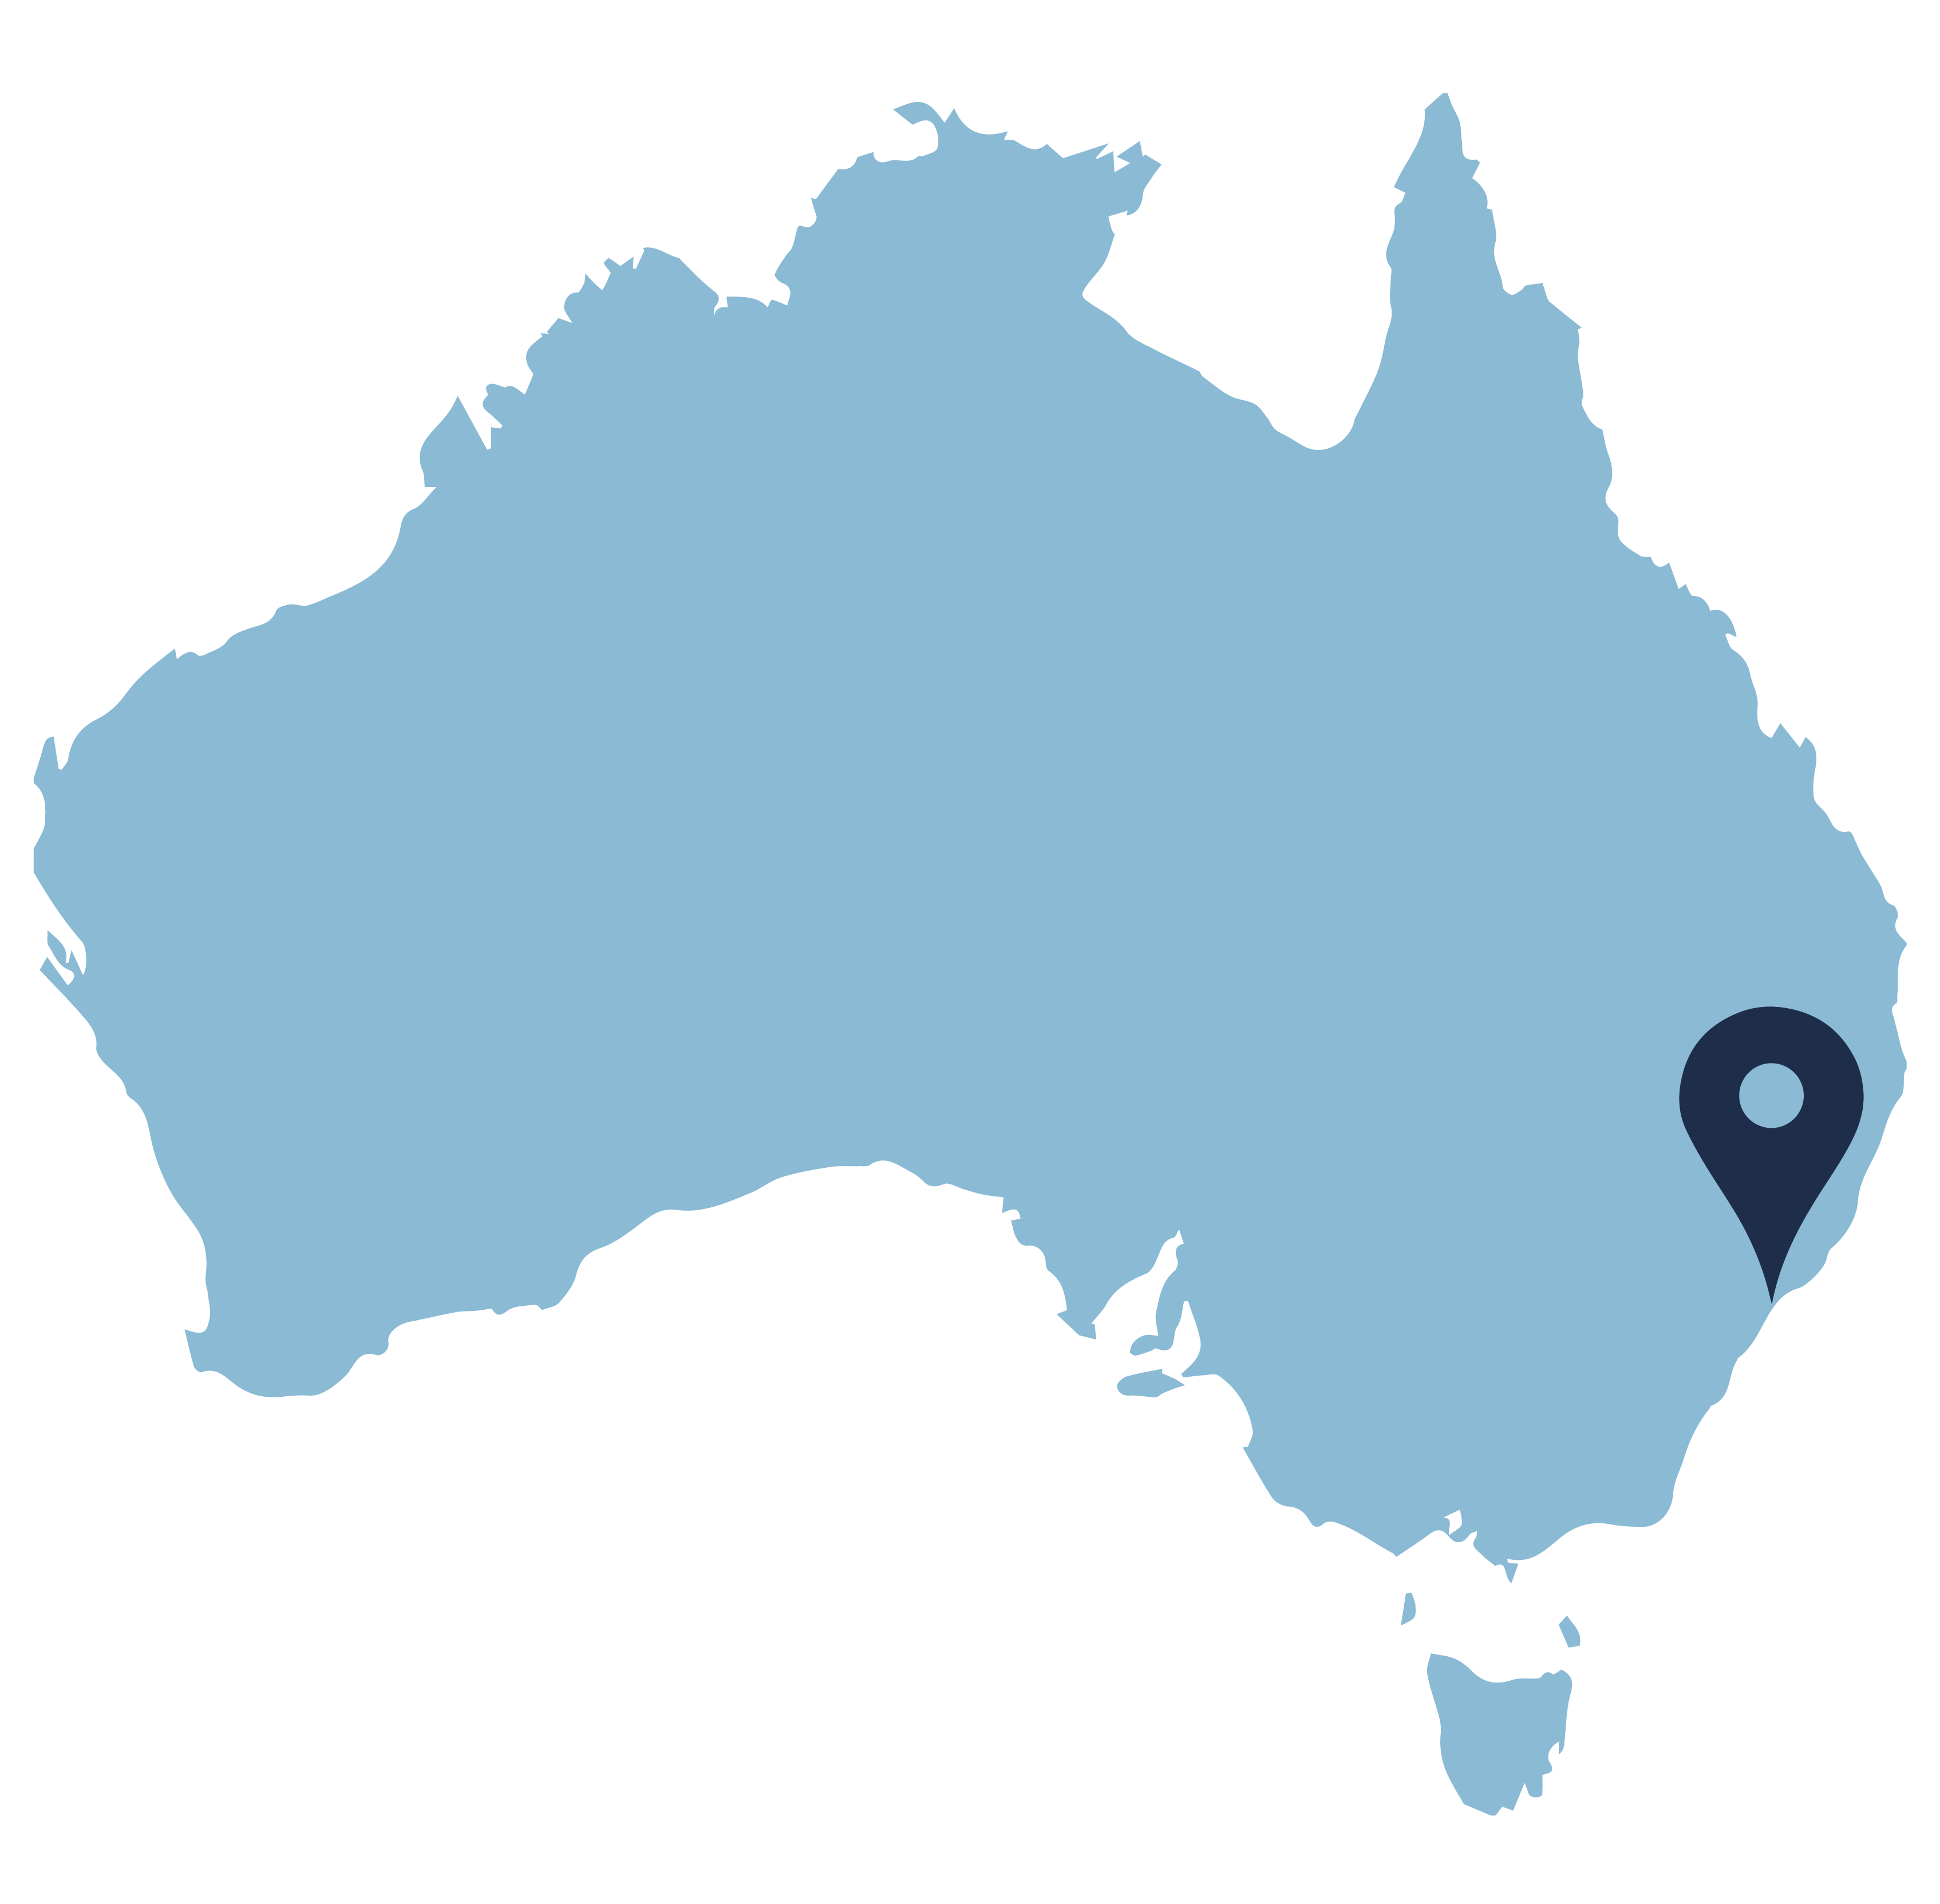 http://lgenestateplan.com/wp-content/uploads/2021/08/Australia-Footer-04.png